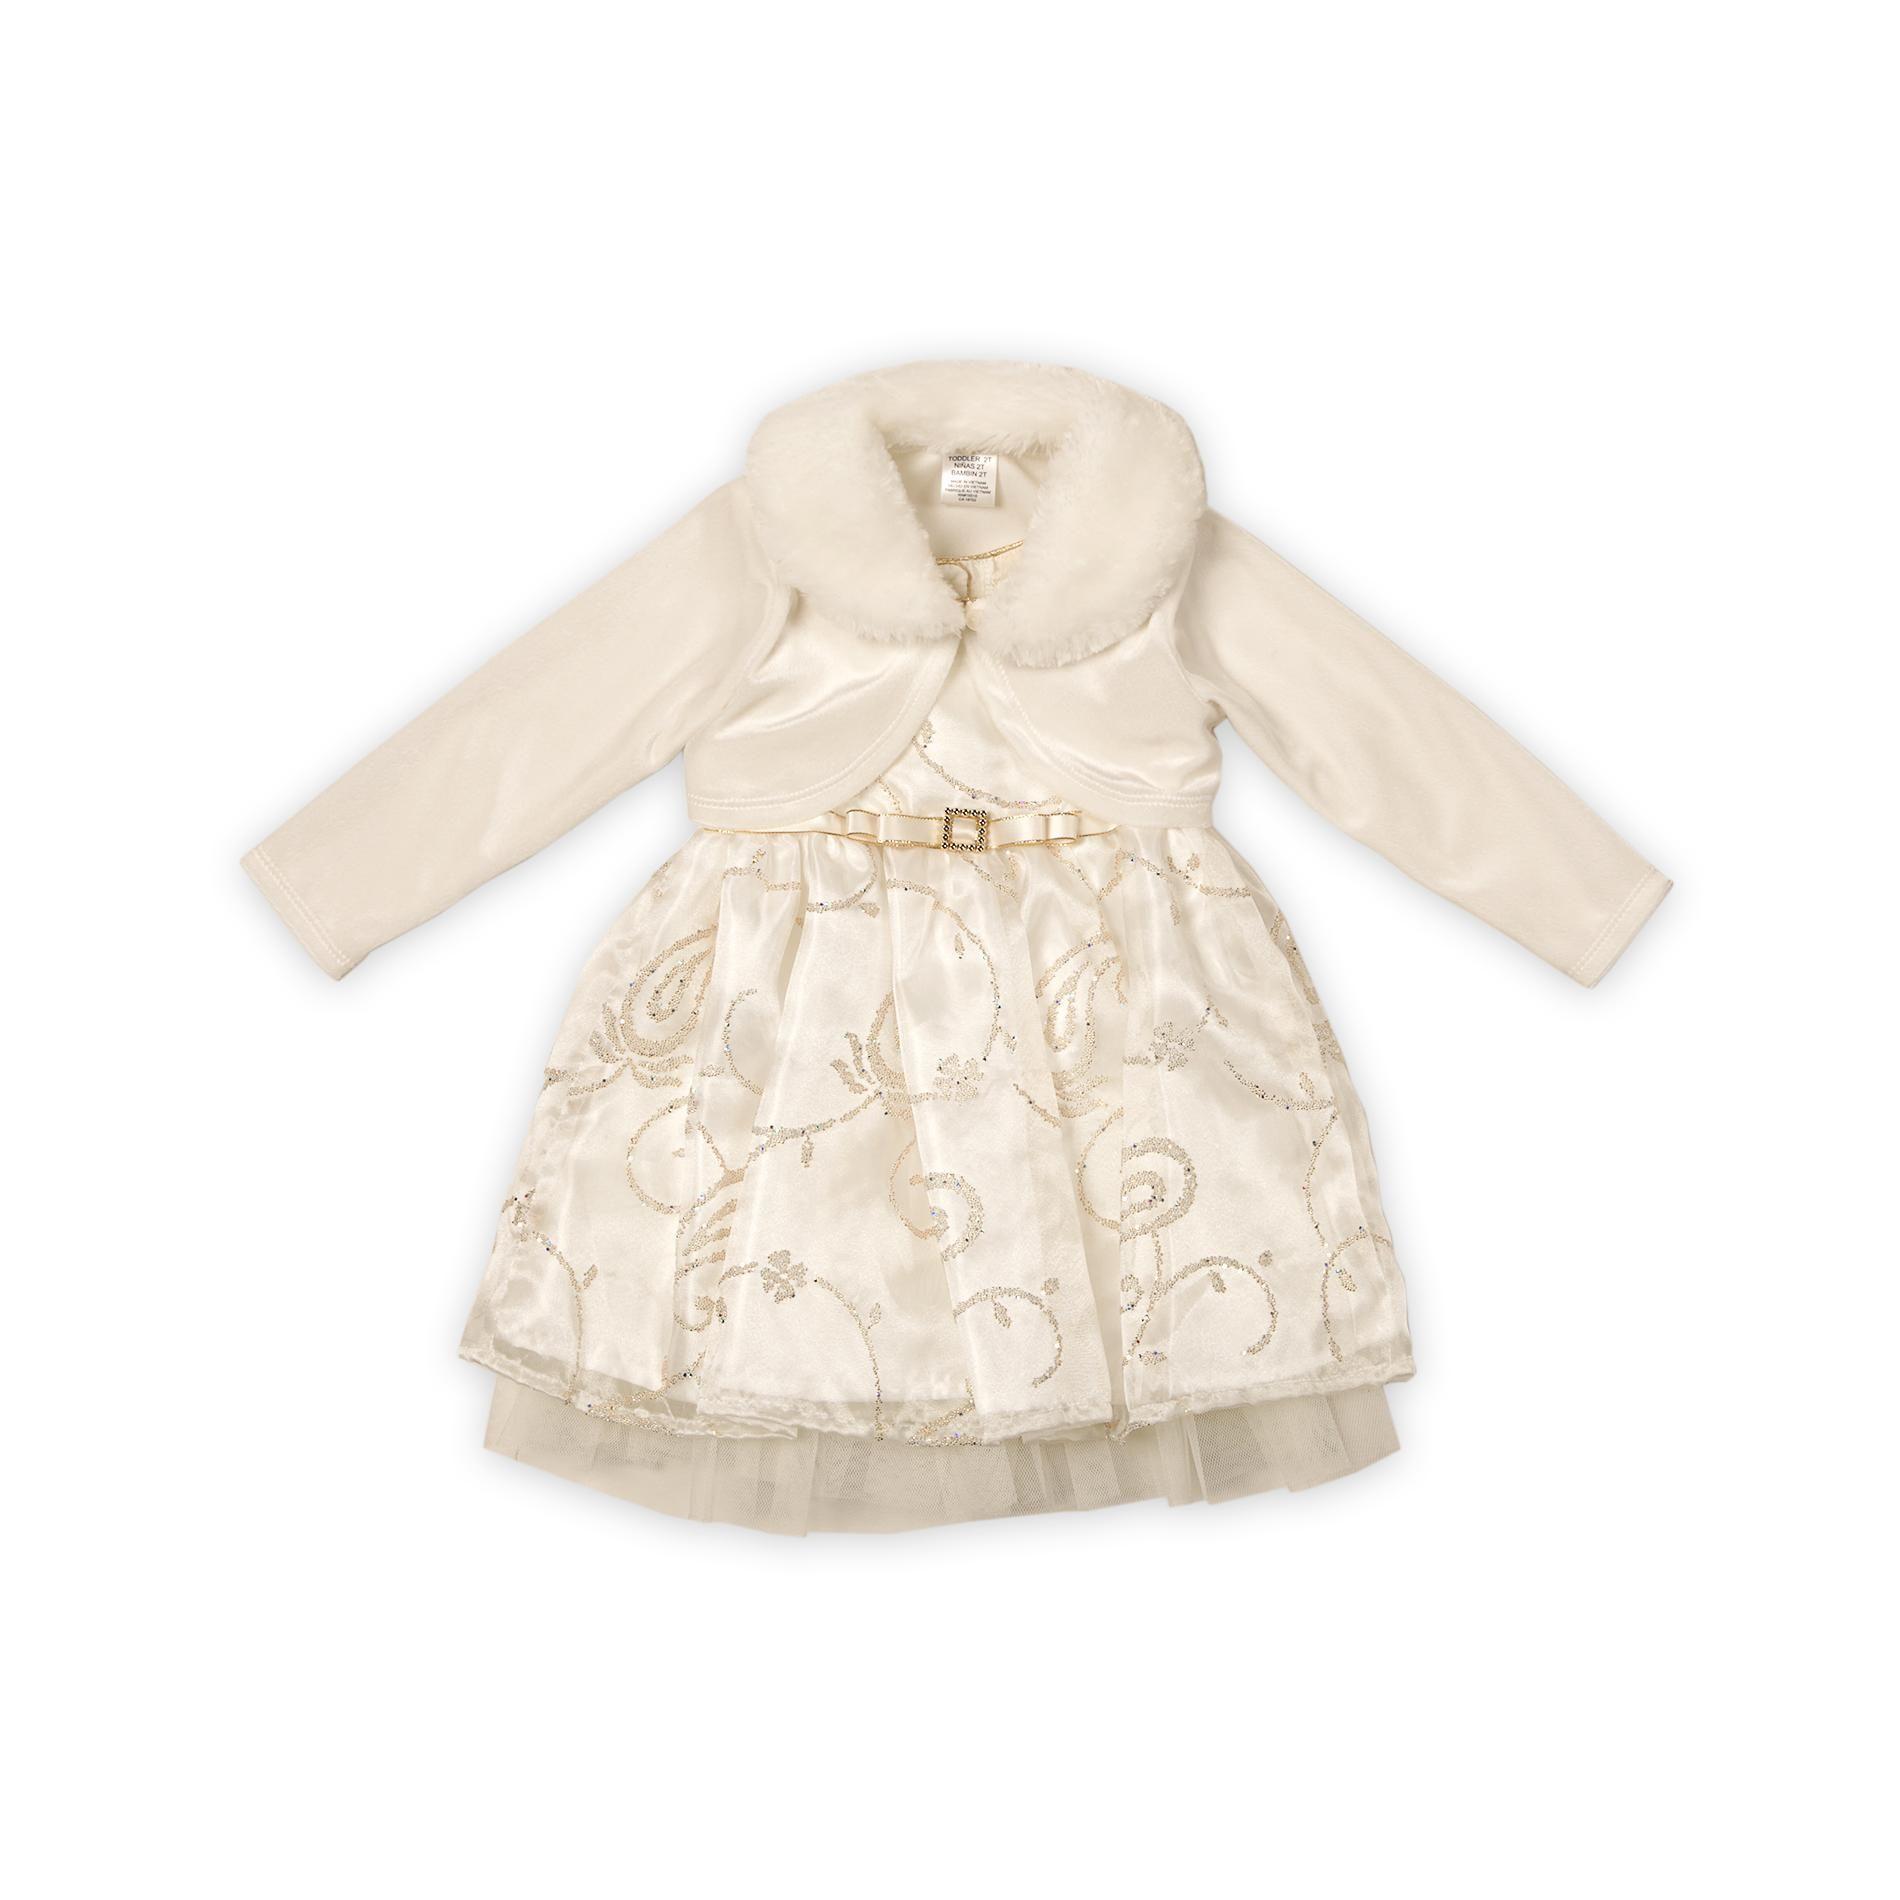 9fcf2dc8f17c Sears $22 Youngland- -Infant & Toddler Girl's Bolero Dress - Glitter  Paisley-Baby-Baby & Toddler Clothing-Dresswear